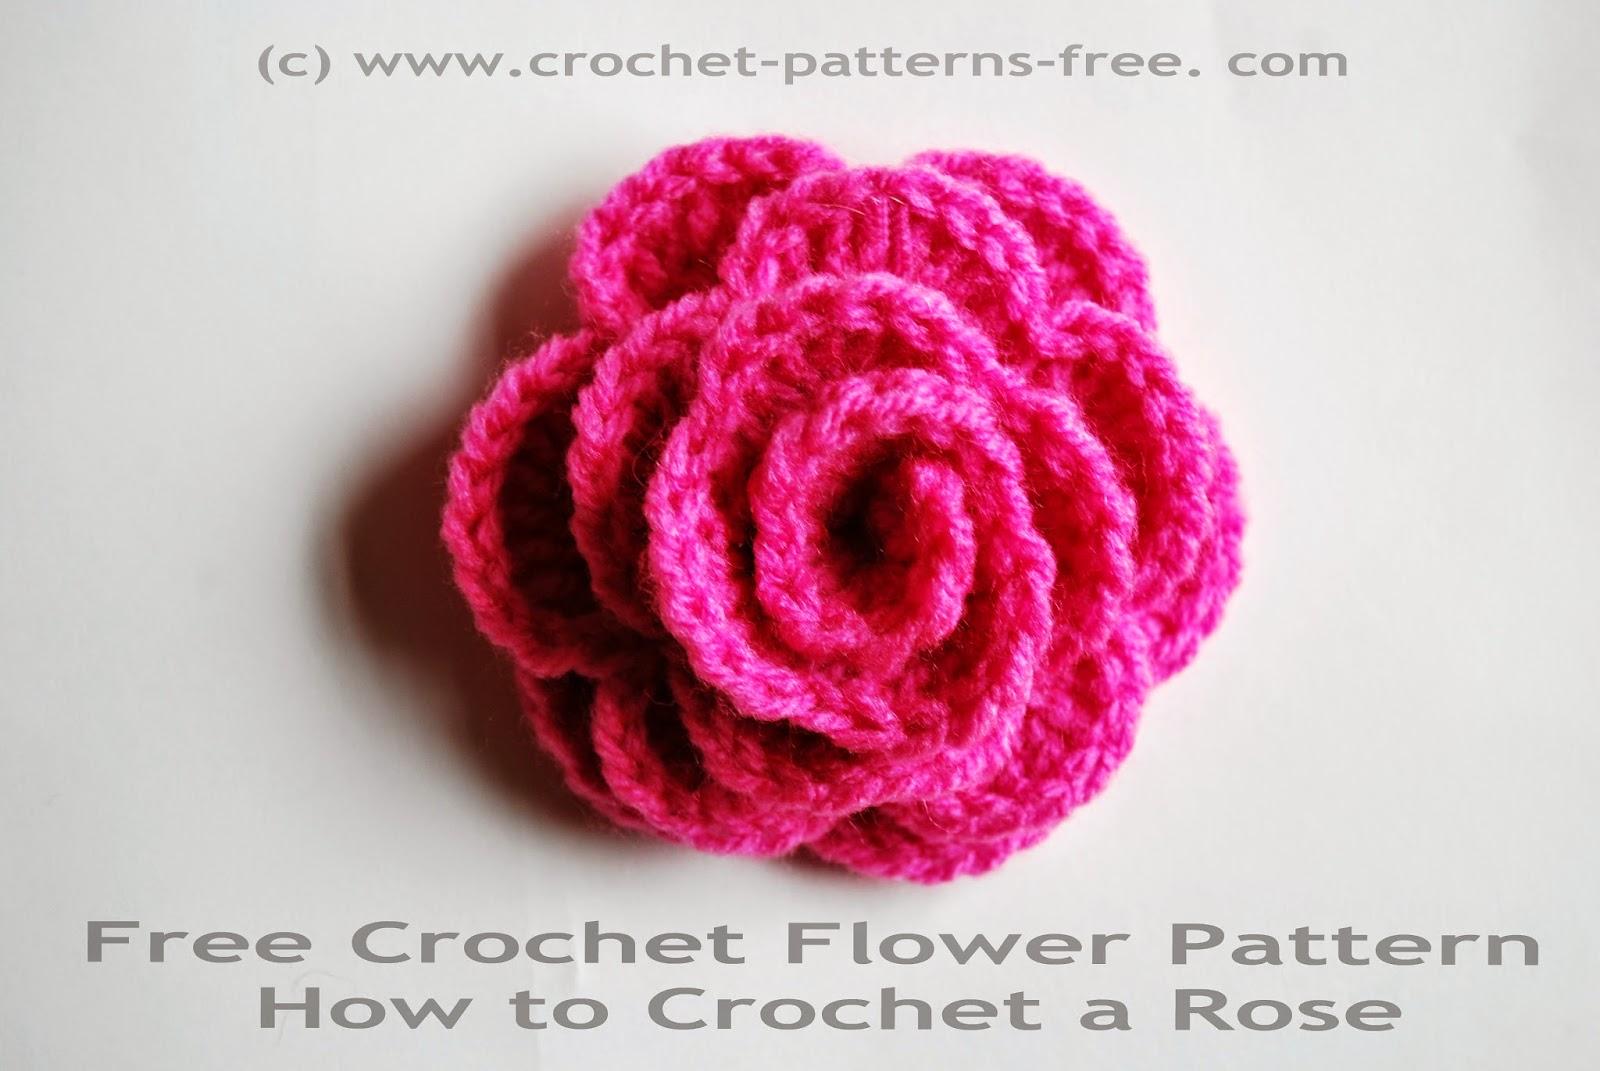 crochet rose pattern free crochet flower patters vebgxpk